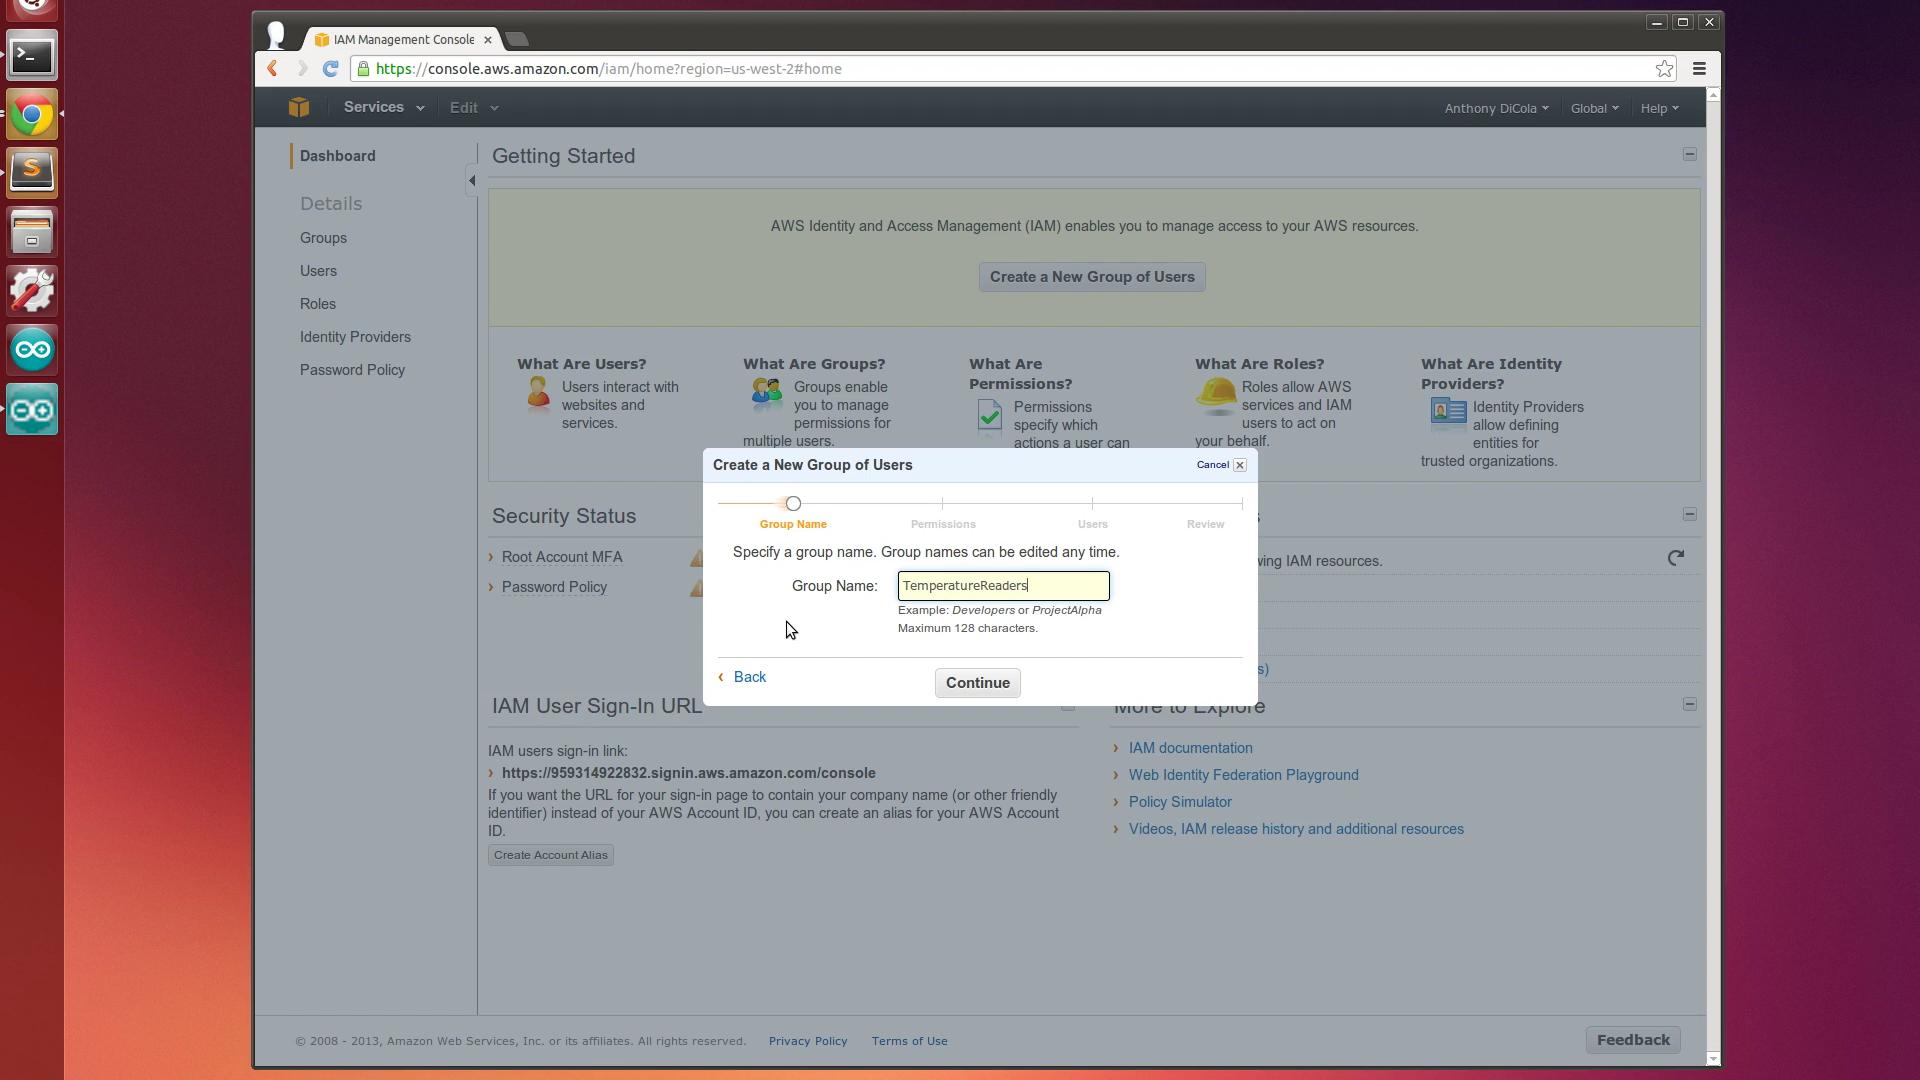 microcontrollers_Screenshot-DynamoDB_Table_Setup.mp4-7.png